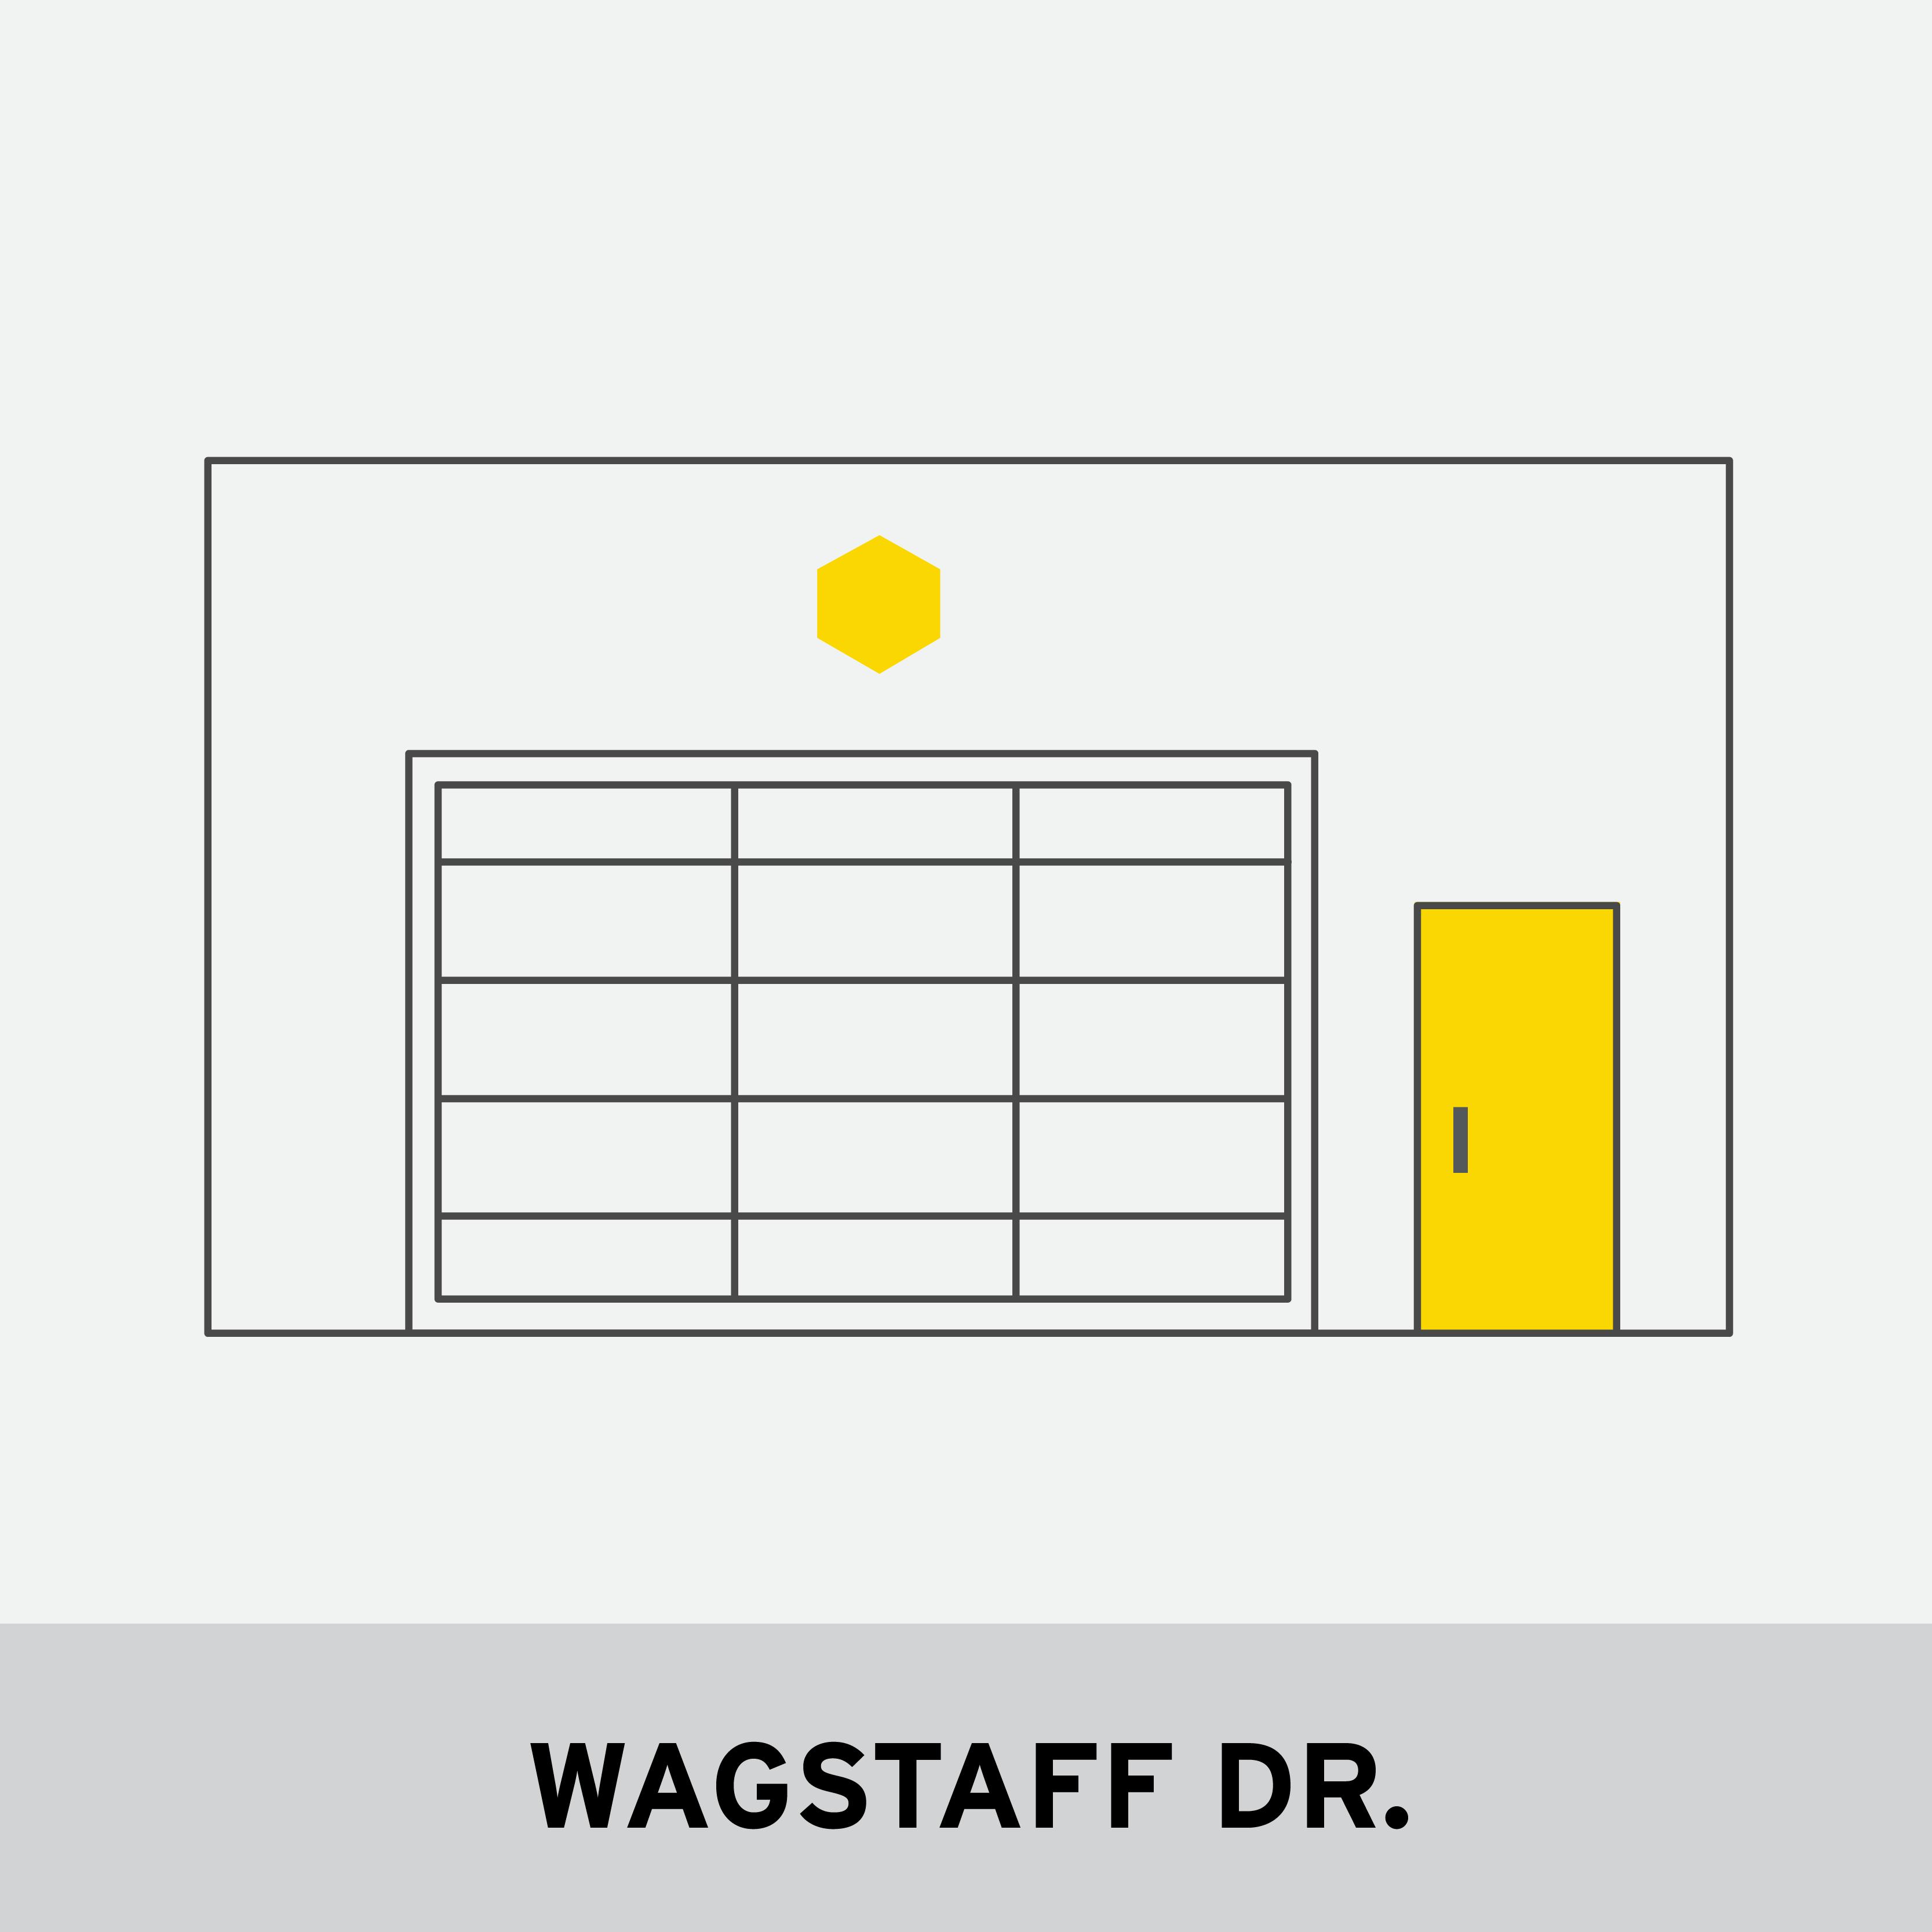 WAGSTAFF DR.